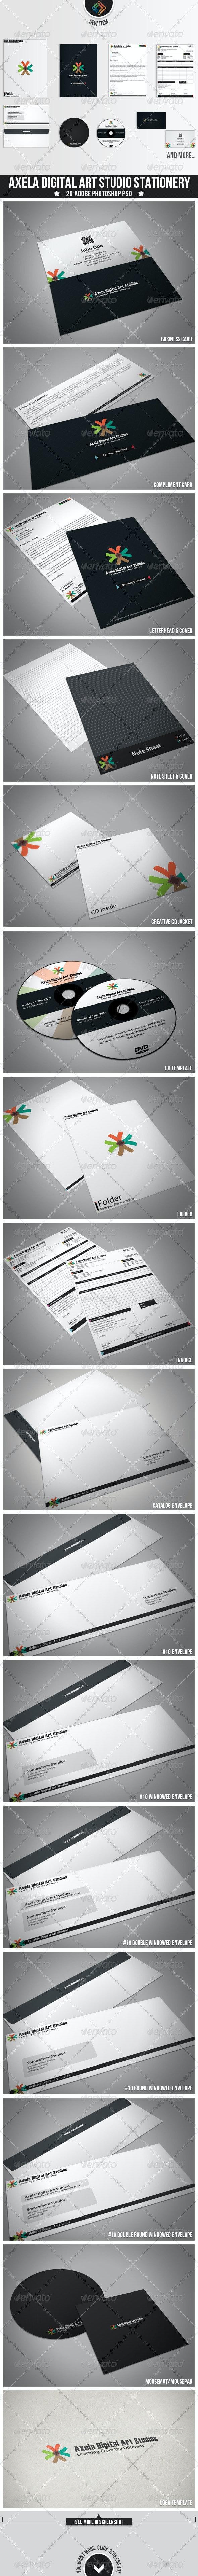 Axela Digital Art Studios Stationery - Stationery Print Templates